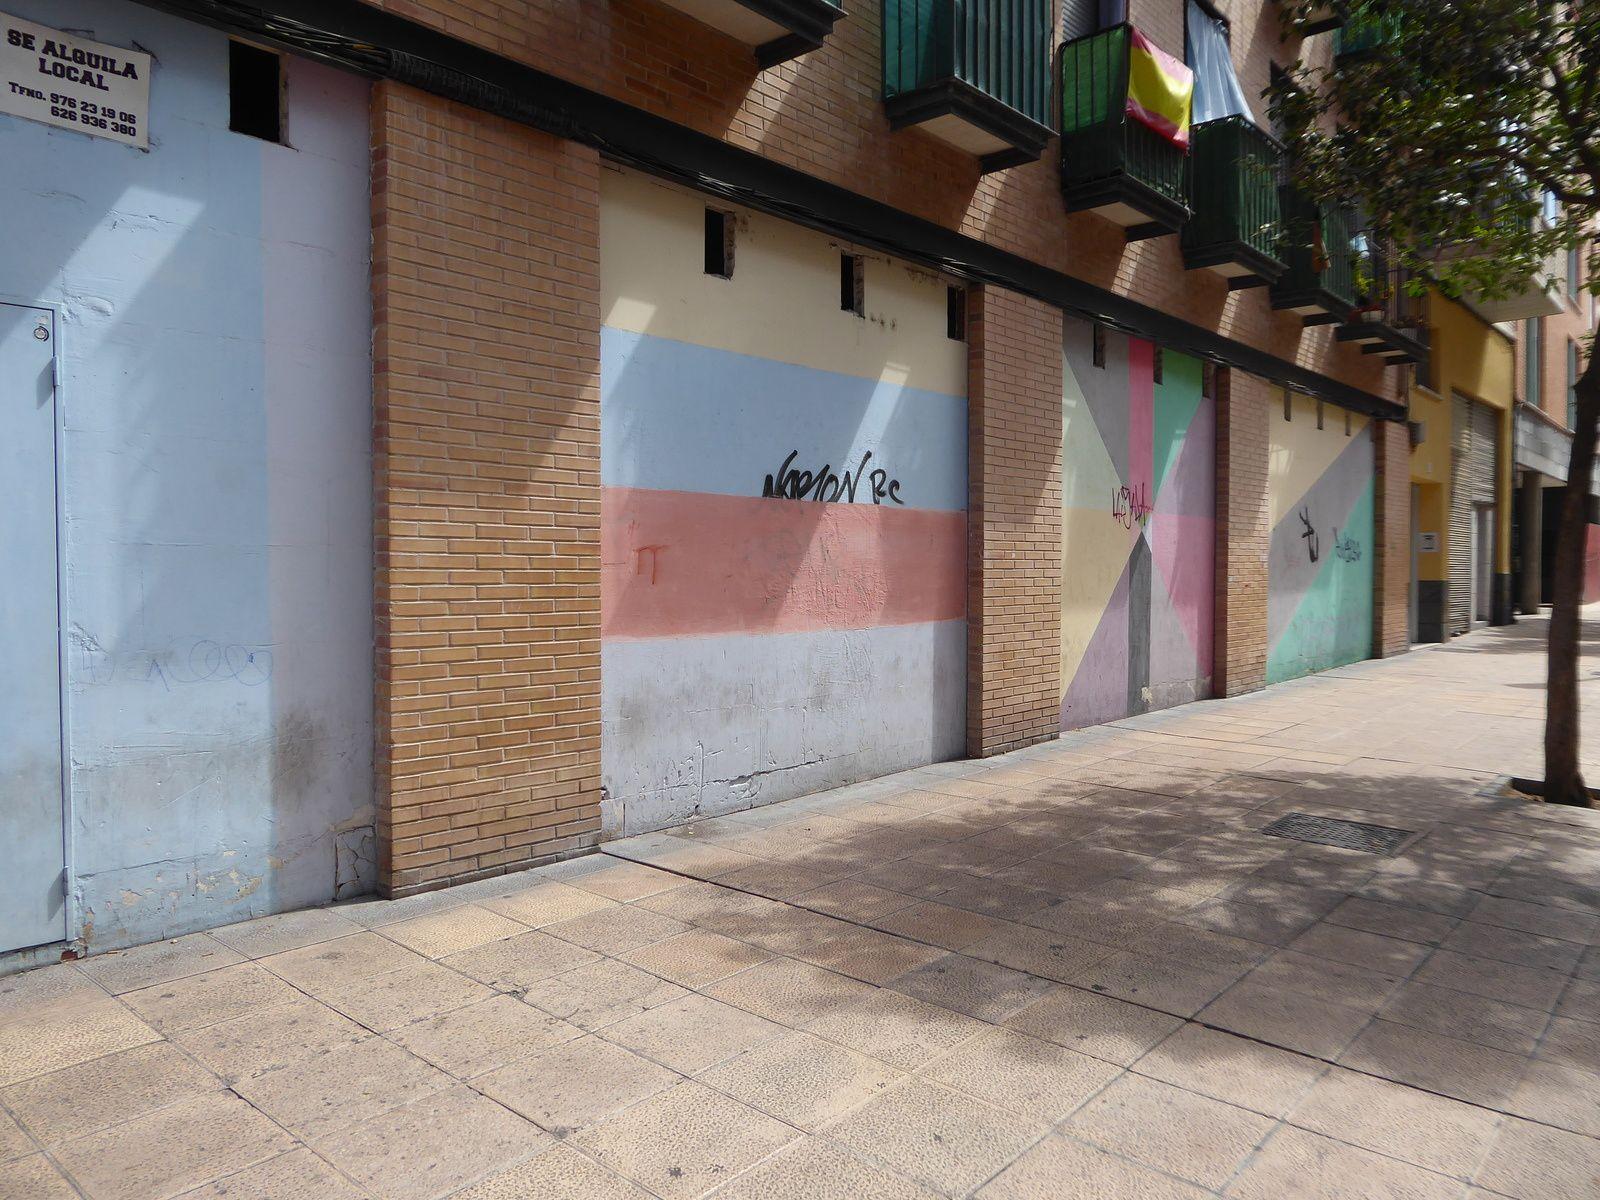 Espagne 2019 #22 Saragosse street art